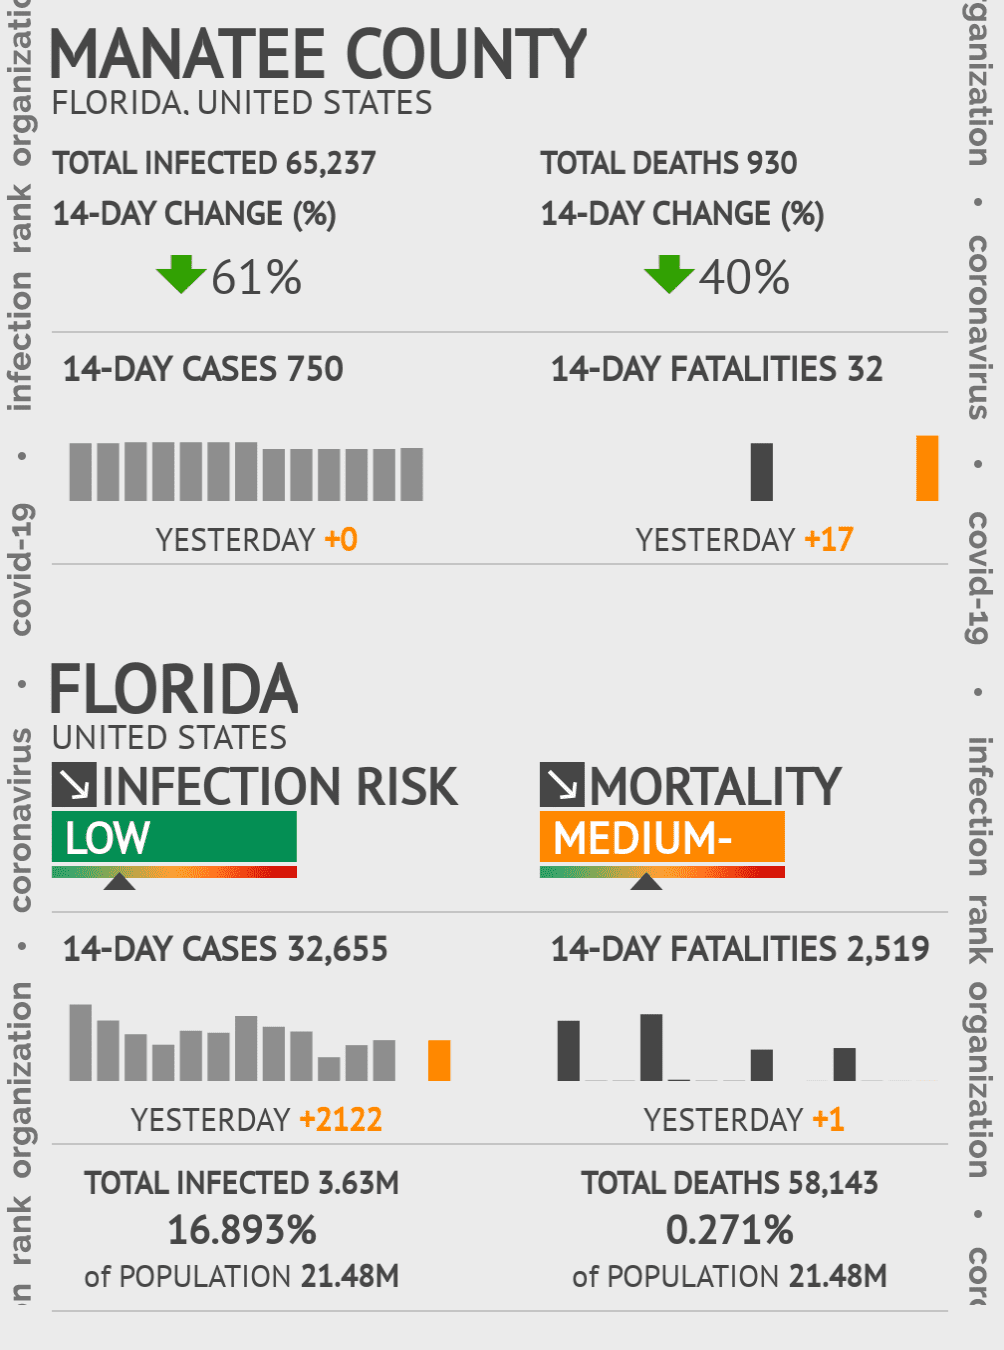 Manatee County Coronavirus Covid-19 Risk of Infection on October 26, 2020